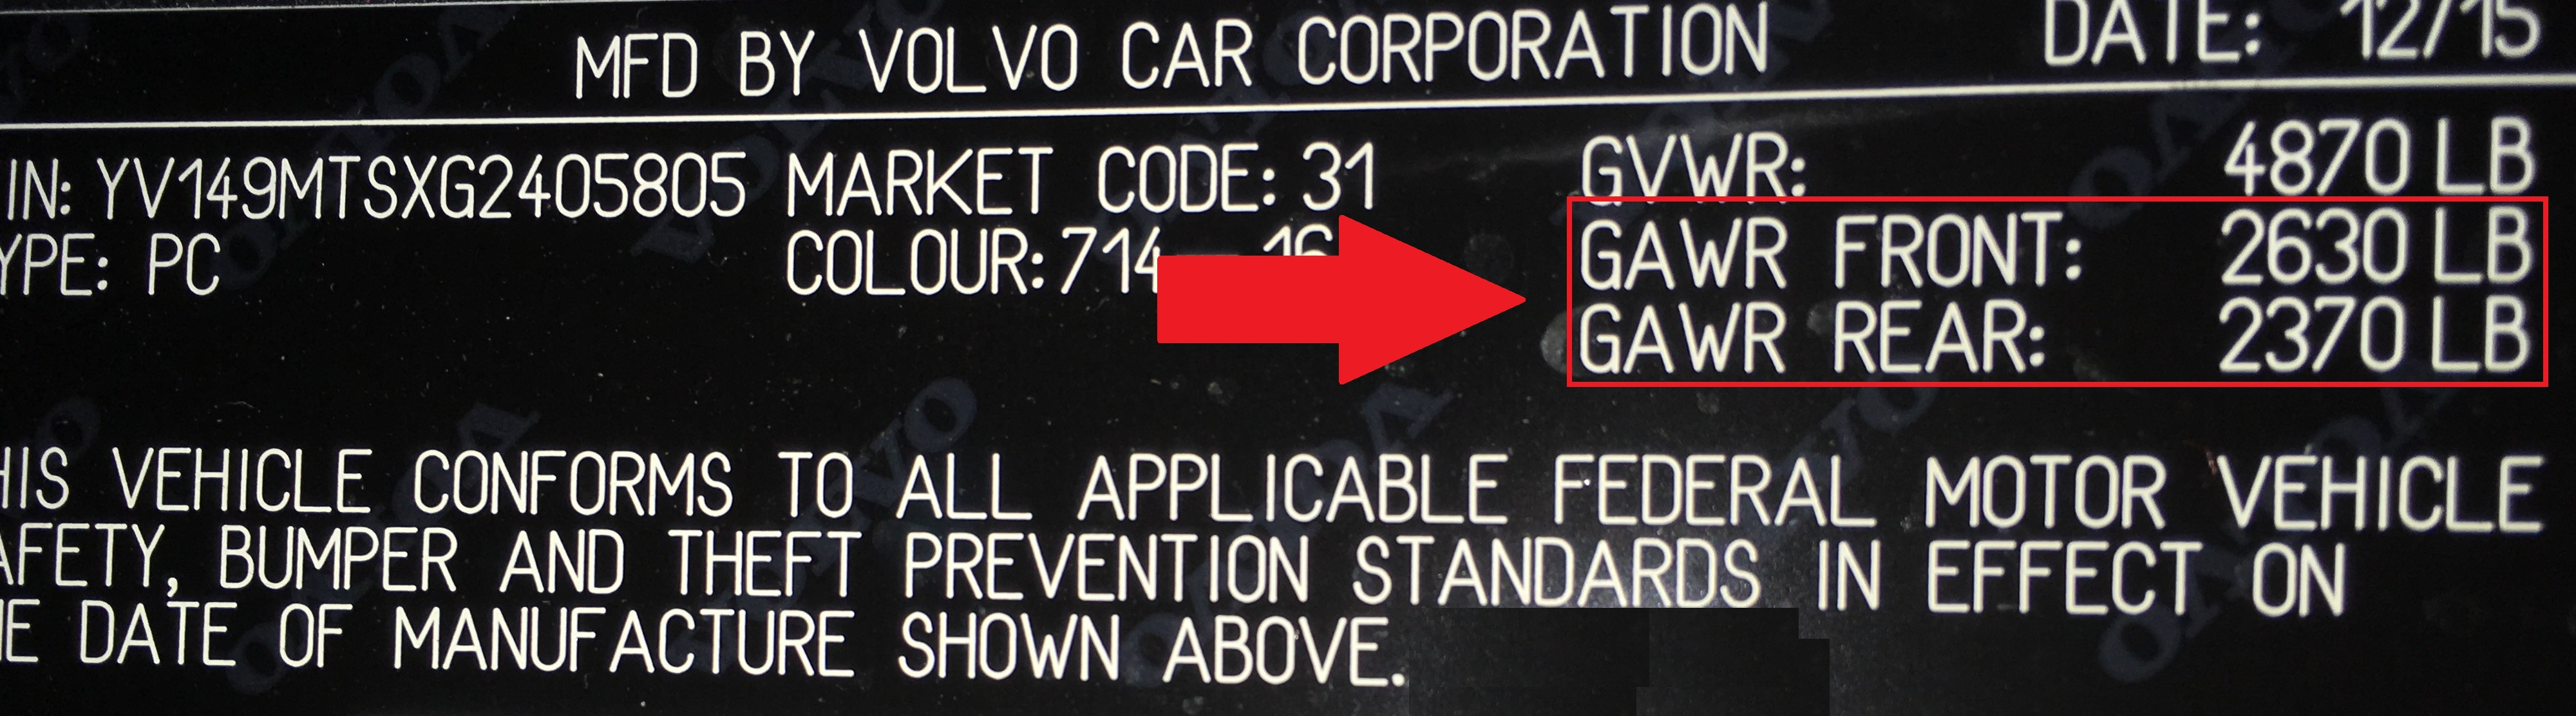 axle-rating.jpg